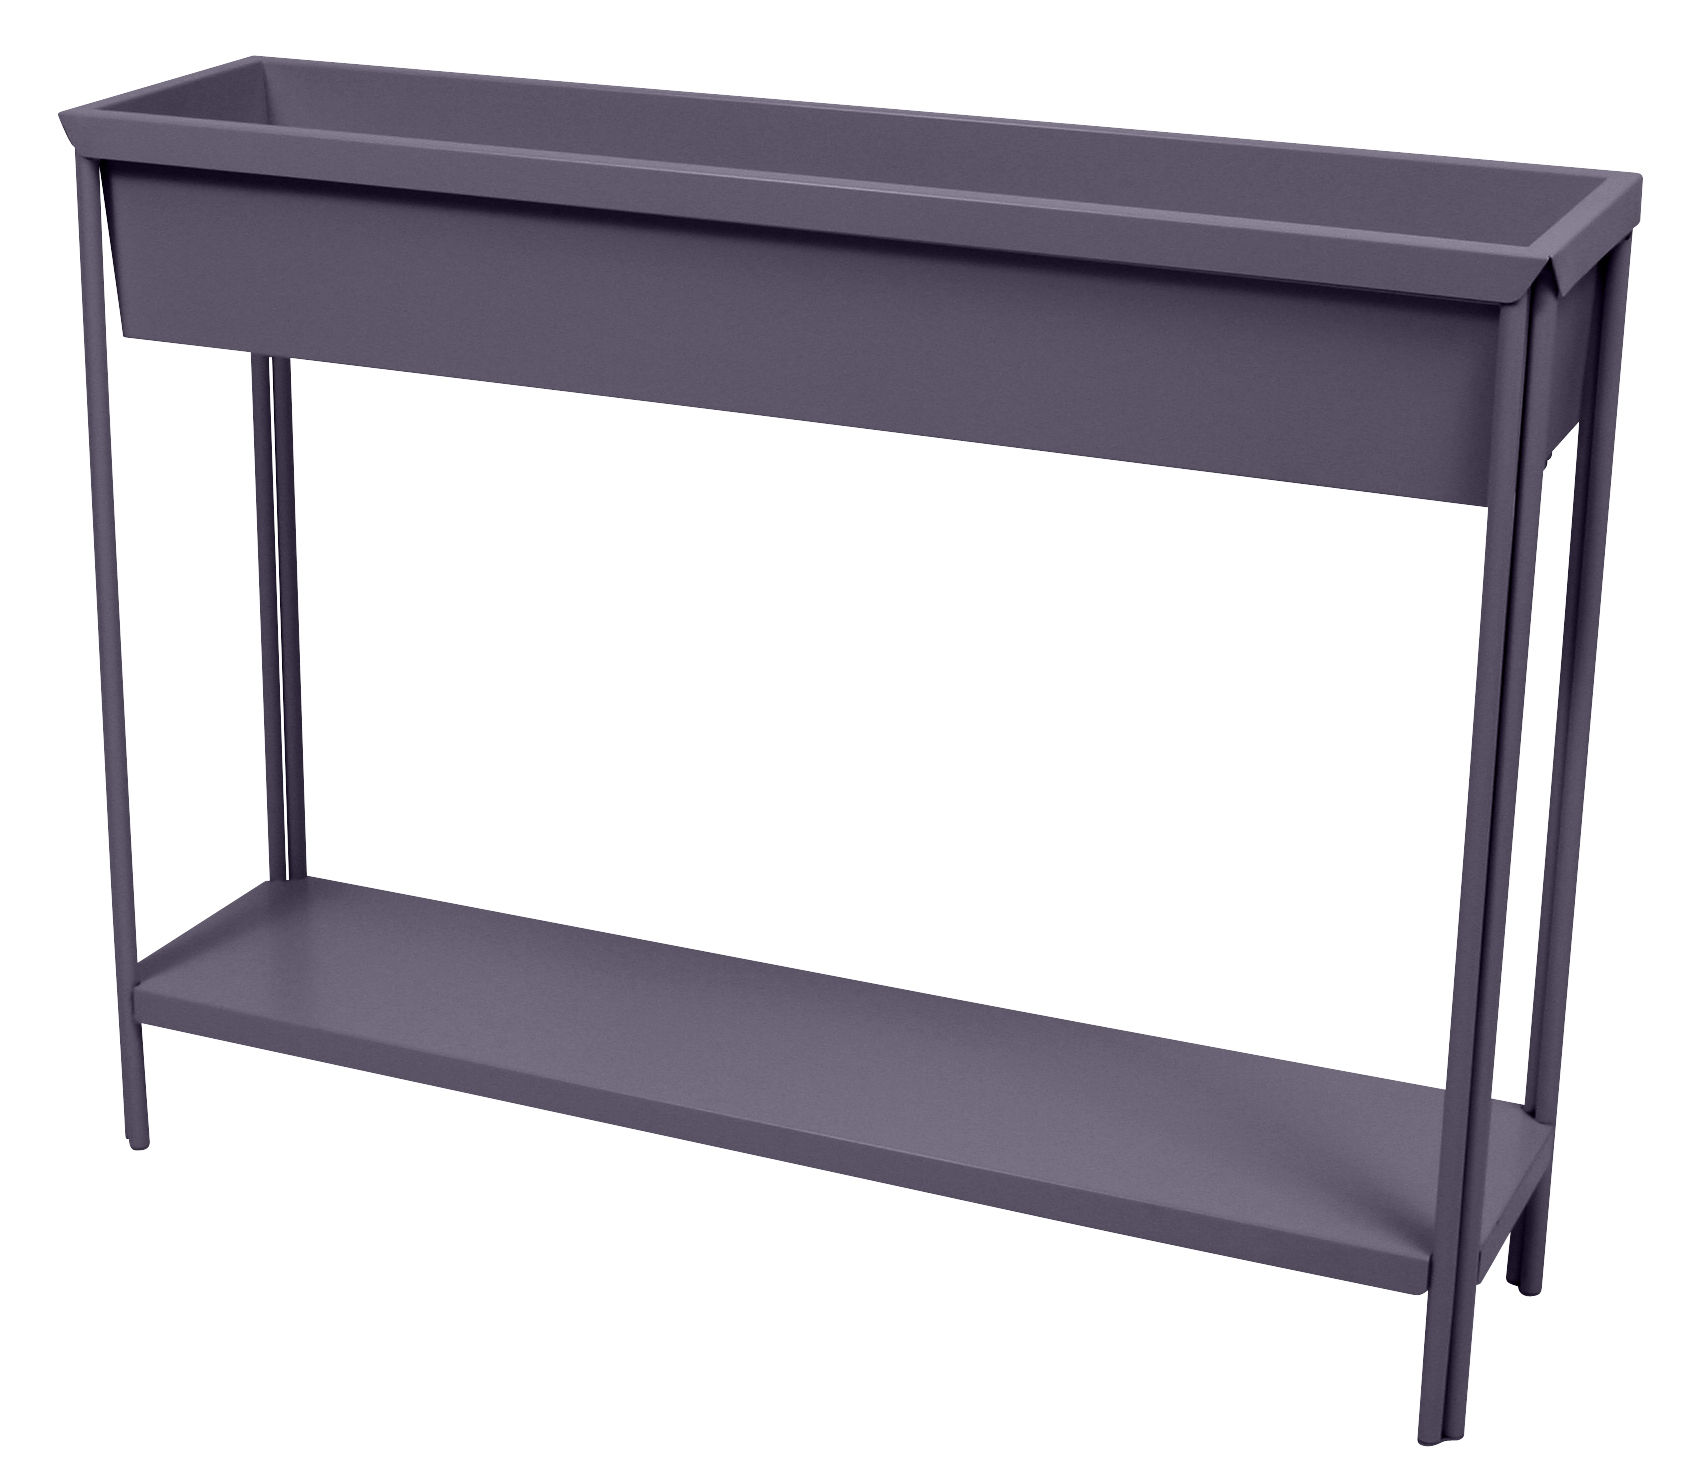 terrazza large h 90 x l 120 cm fermob blumenkasten. Black Bedroom Furniture Sets. Home Design Ideas